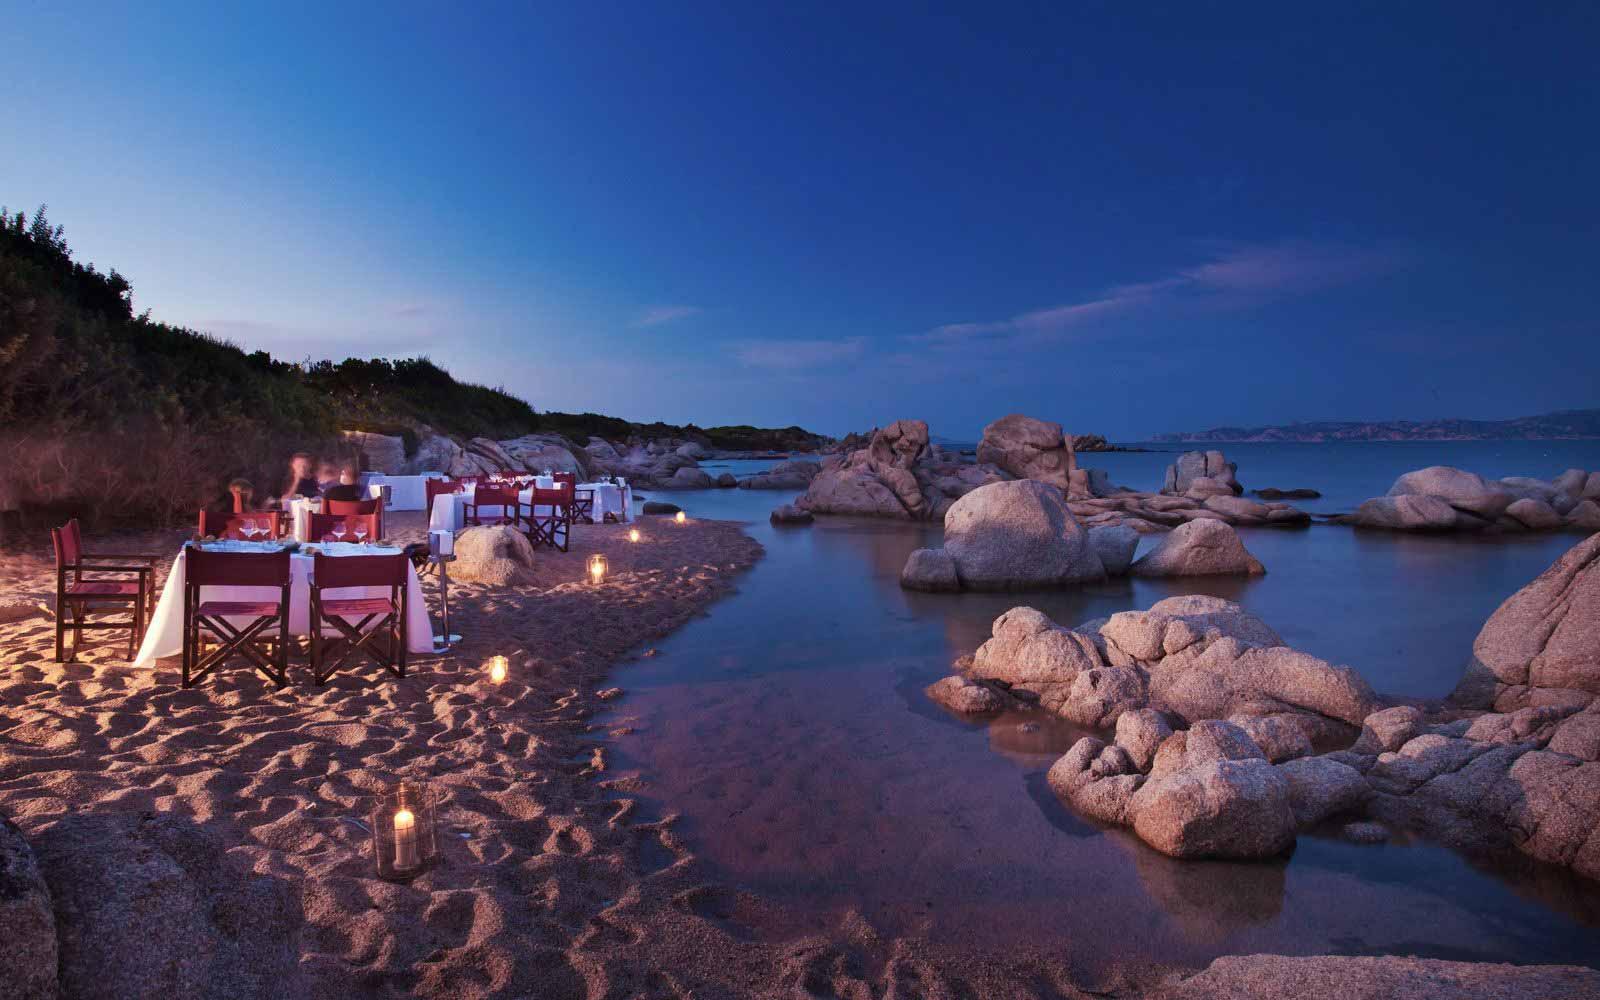 Li Zini Restaurant at Resort Valle Dell'Erica Thalasso & Spa